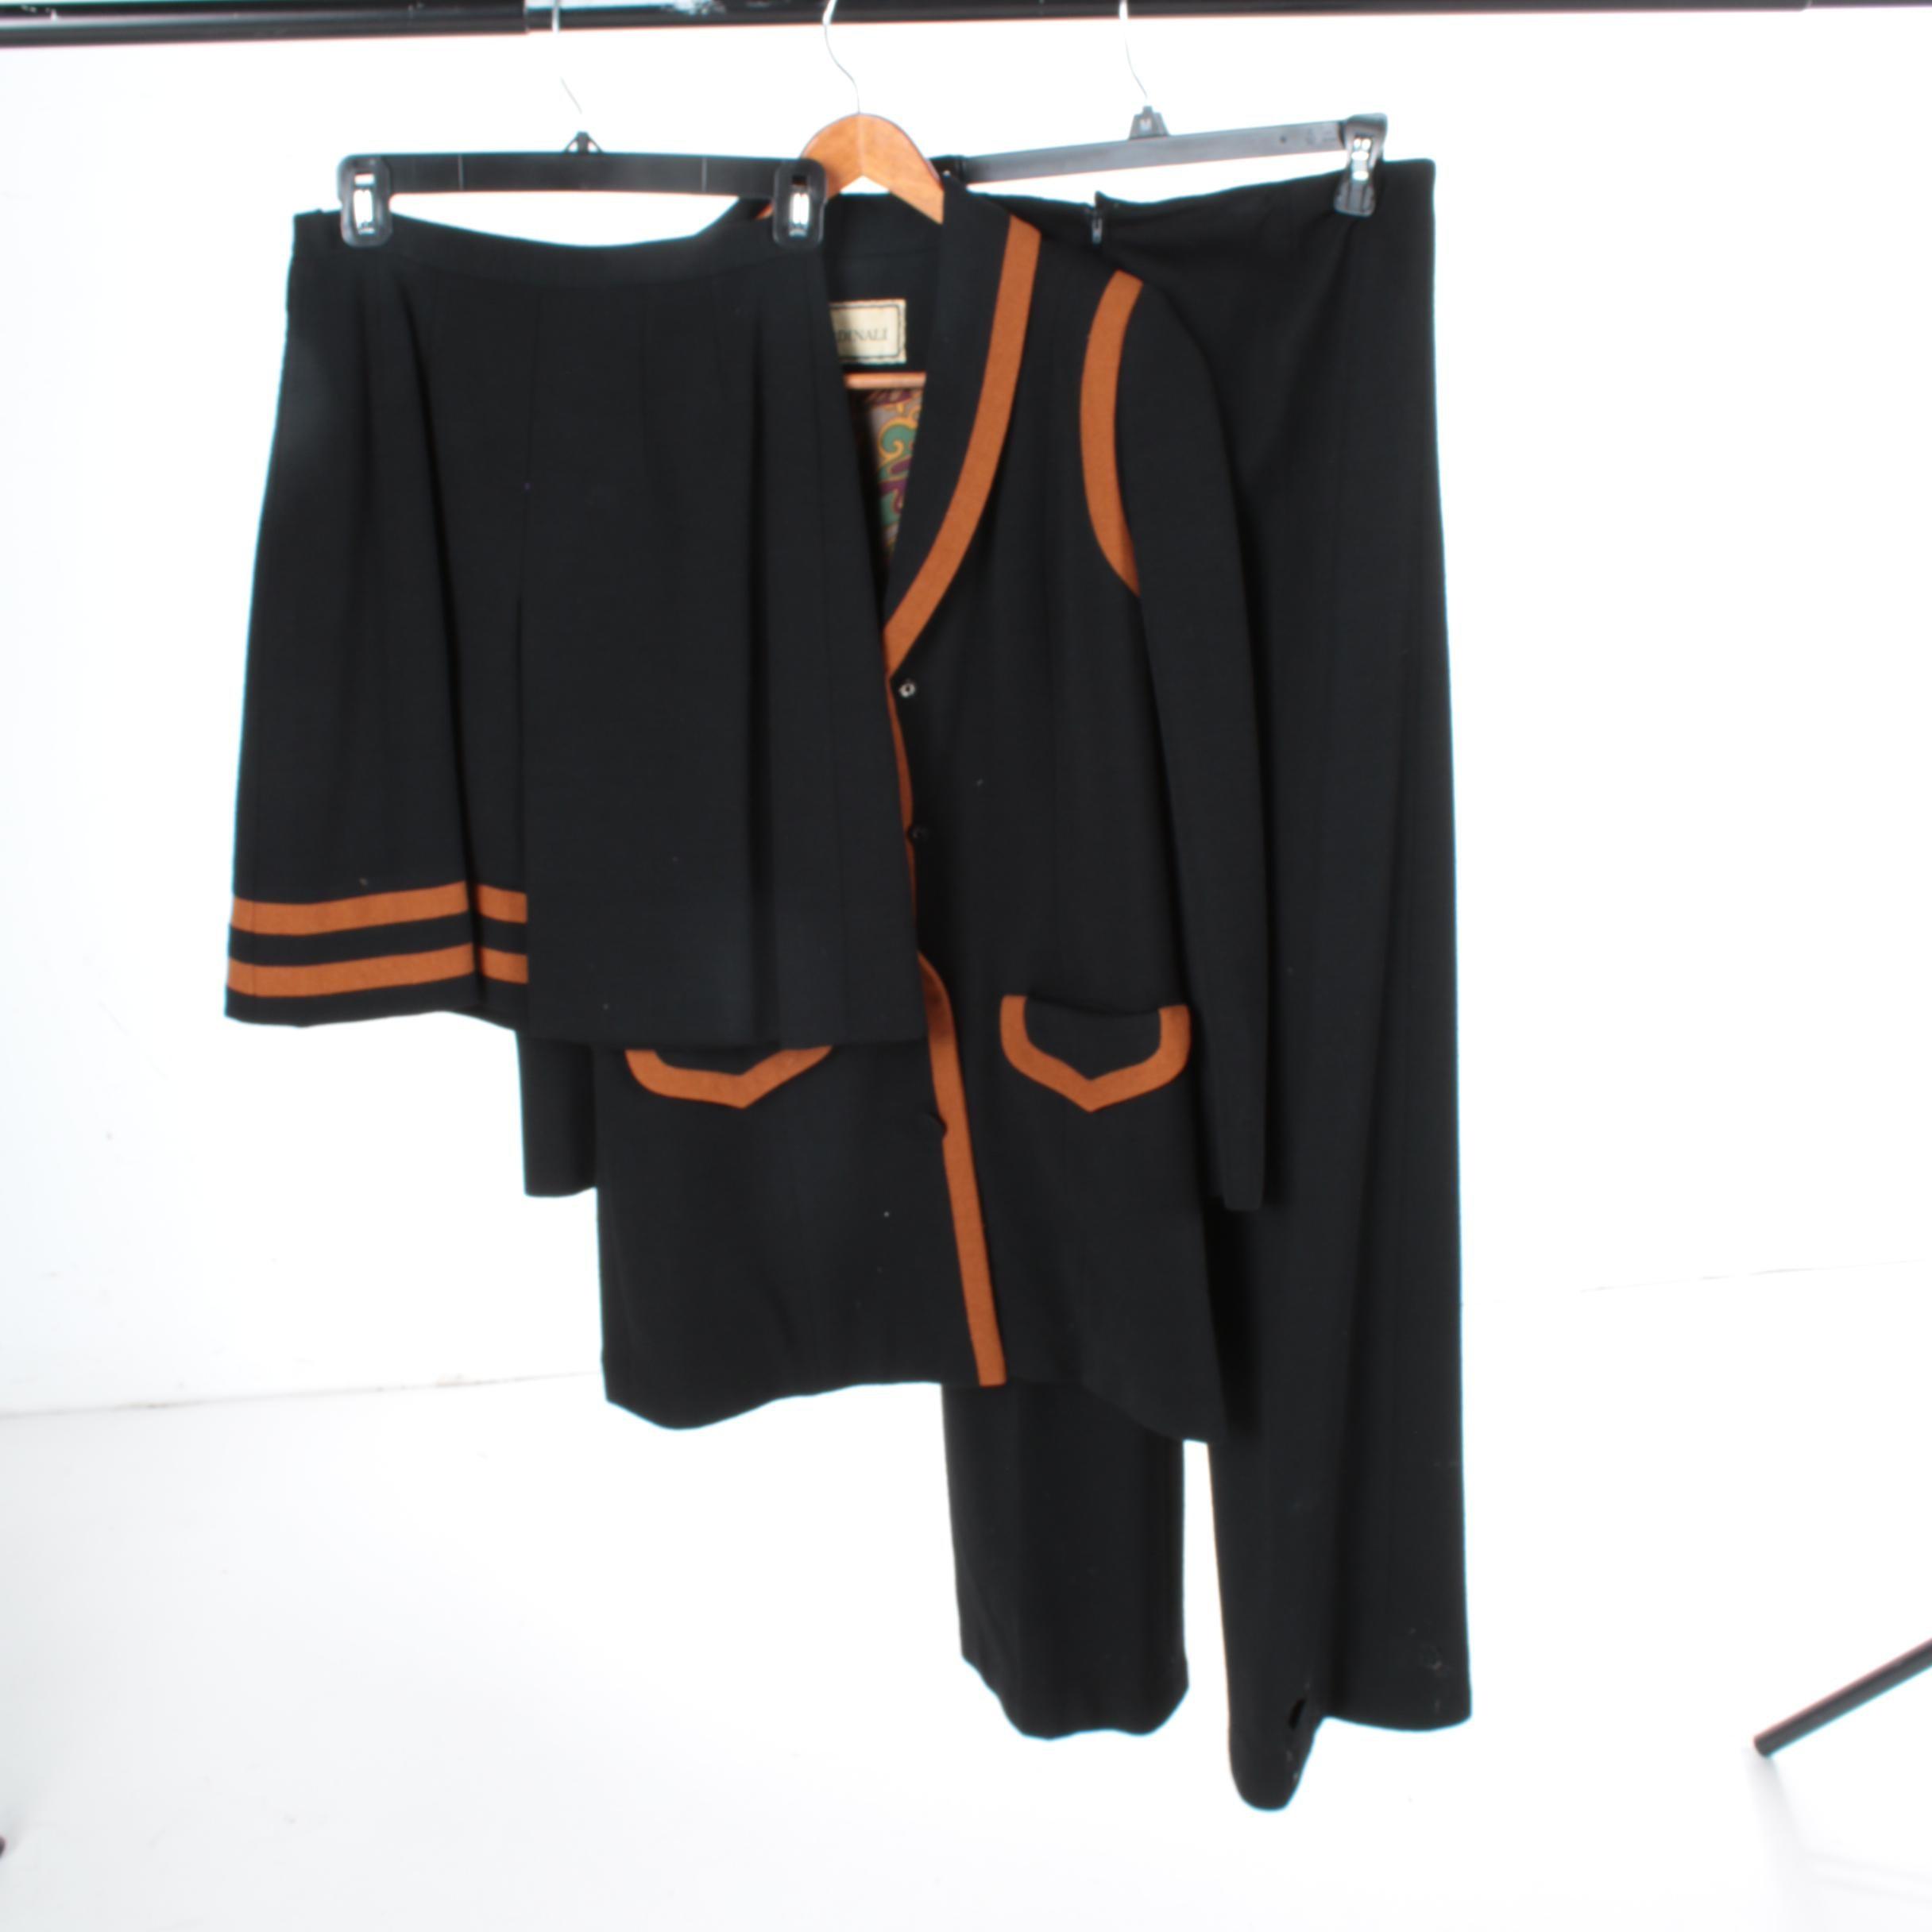 Cardinali Sample Black Wool Three Piece Ensemble